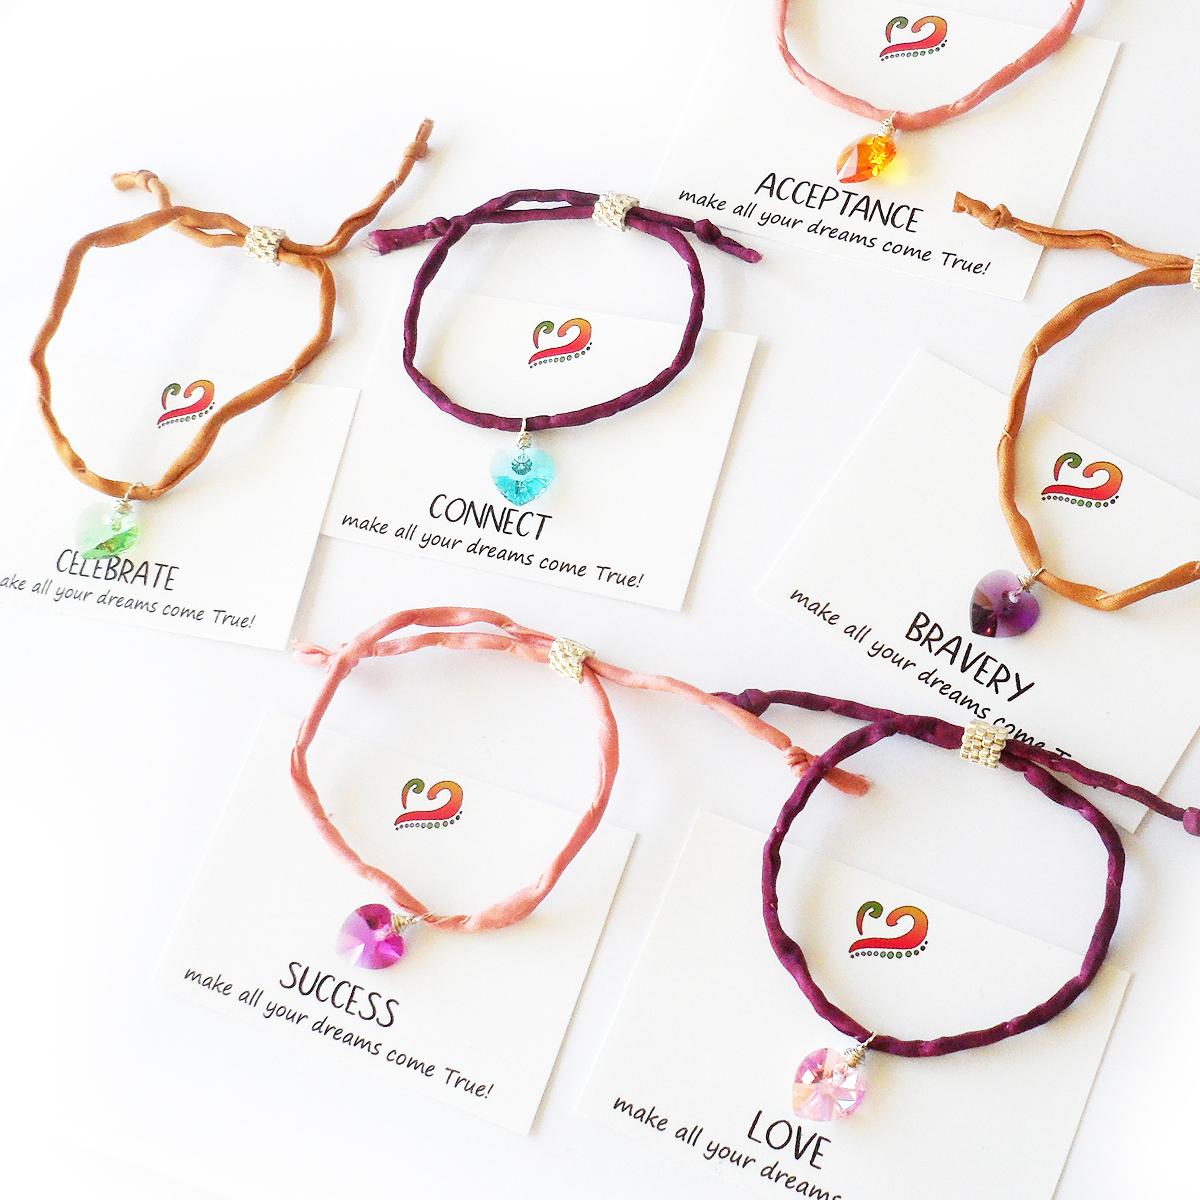 swarovski-heart-bracelet-with-silk-cord-your-word-of-the-year-bracelet